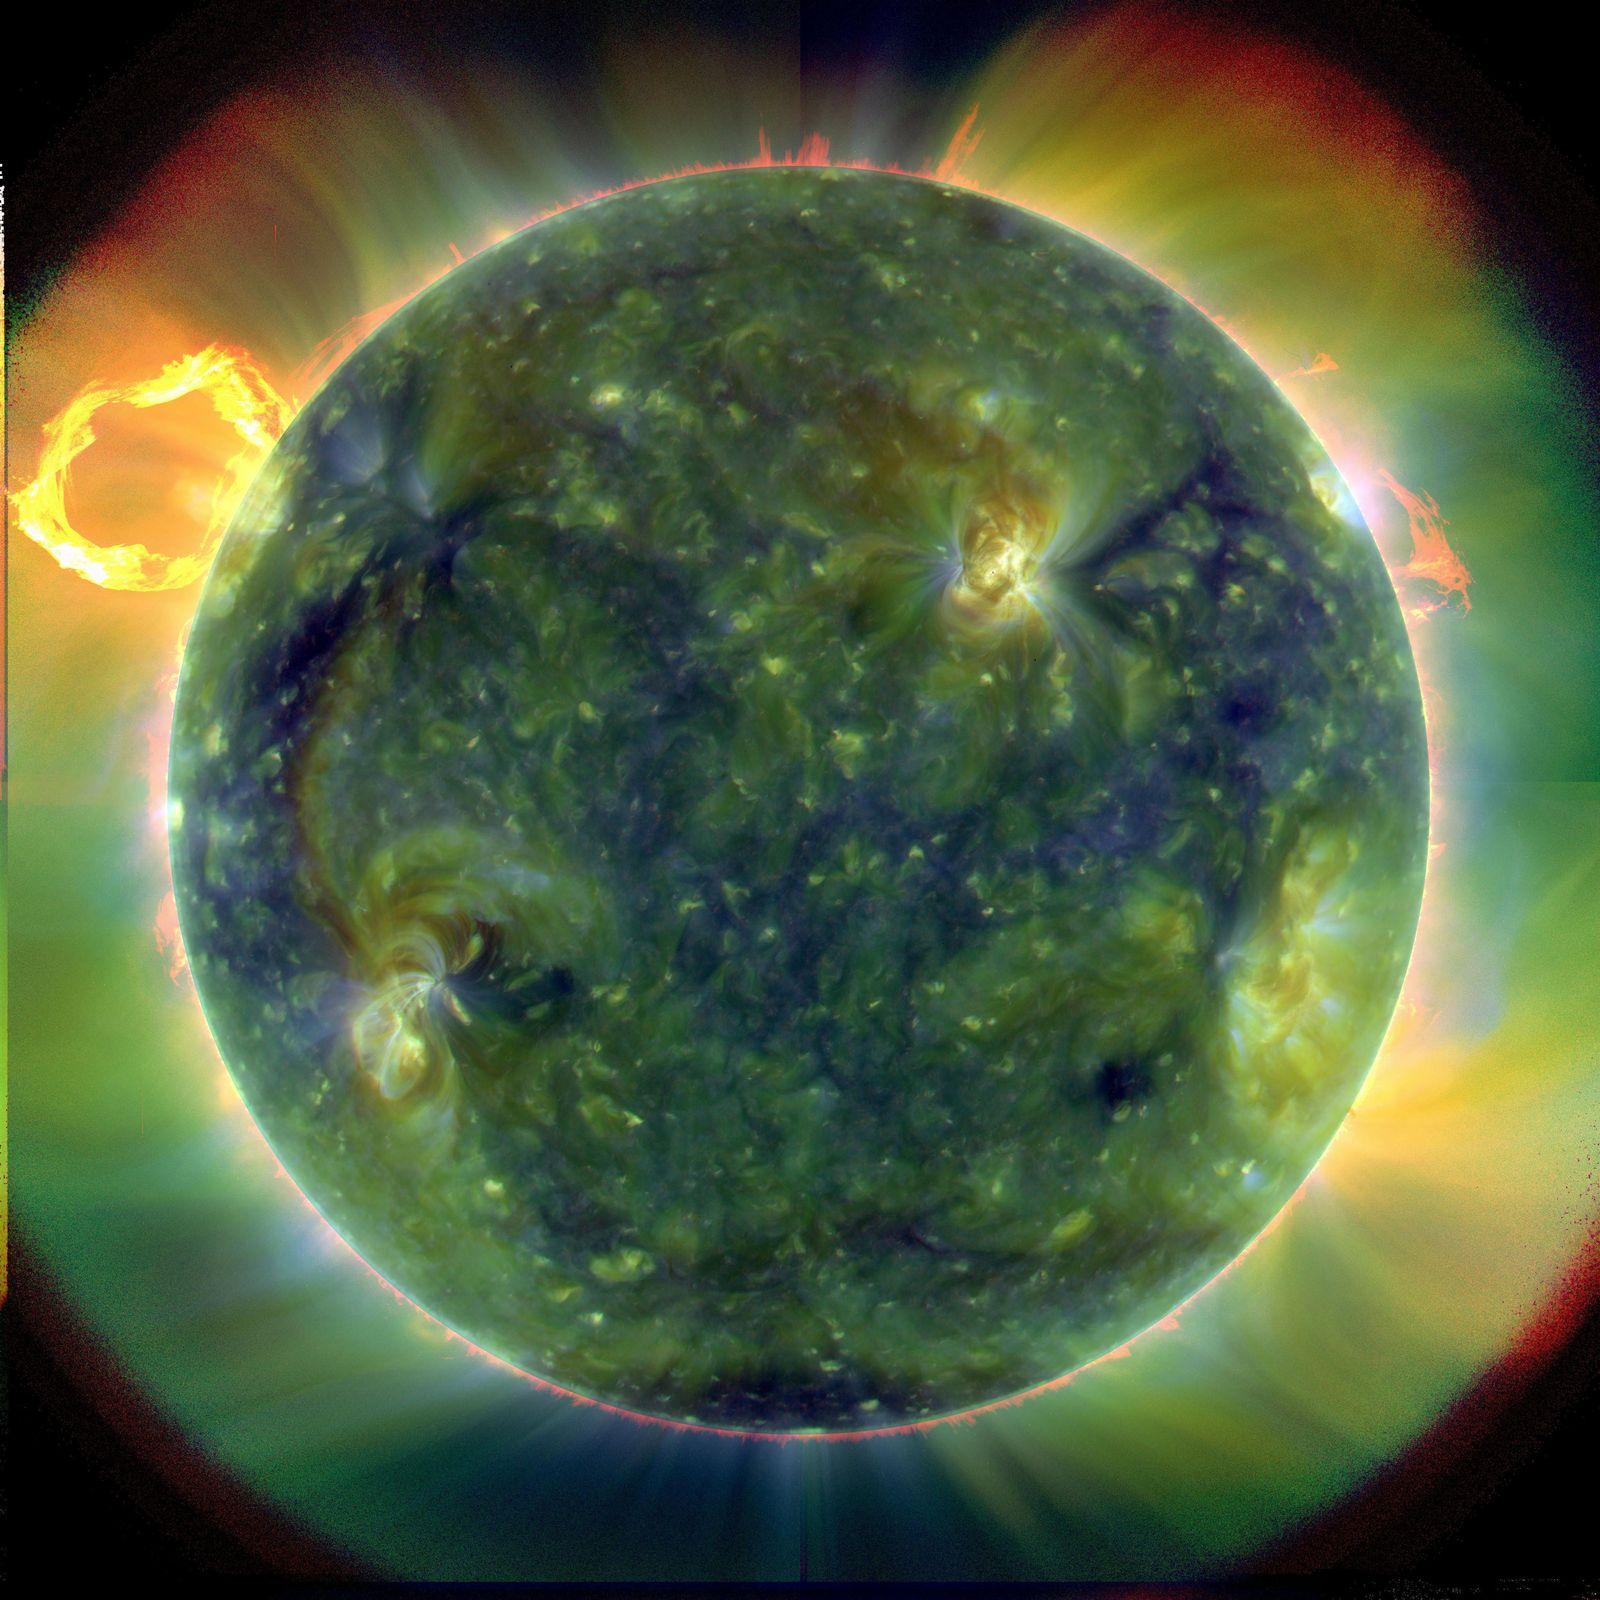 NASA-Sonnensatellit funkt «atemberaubende» erste Bilder